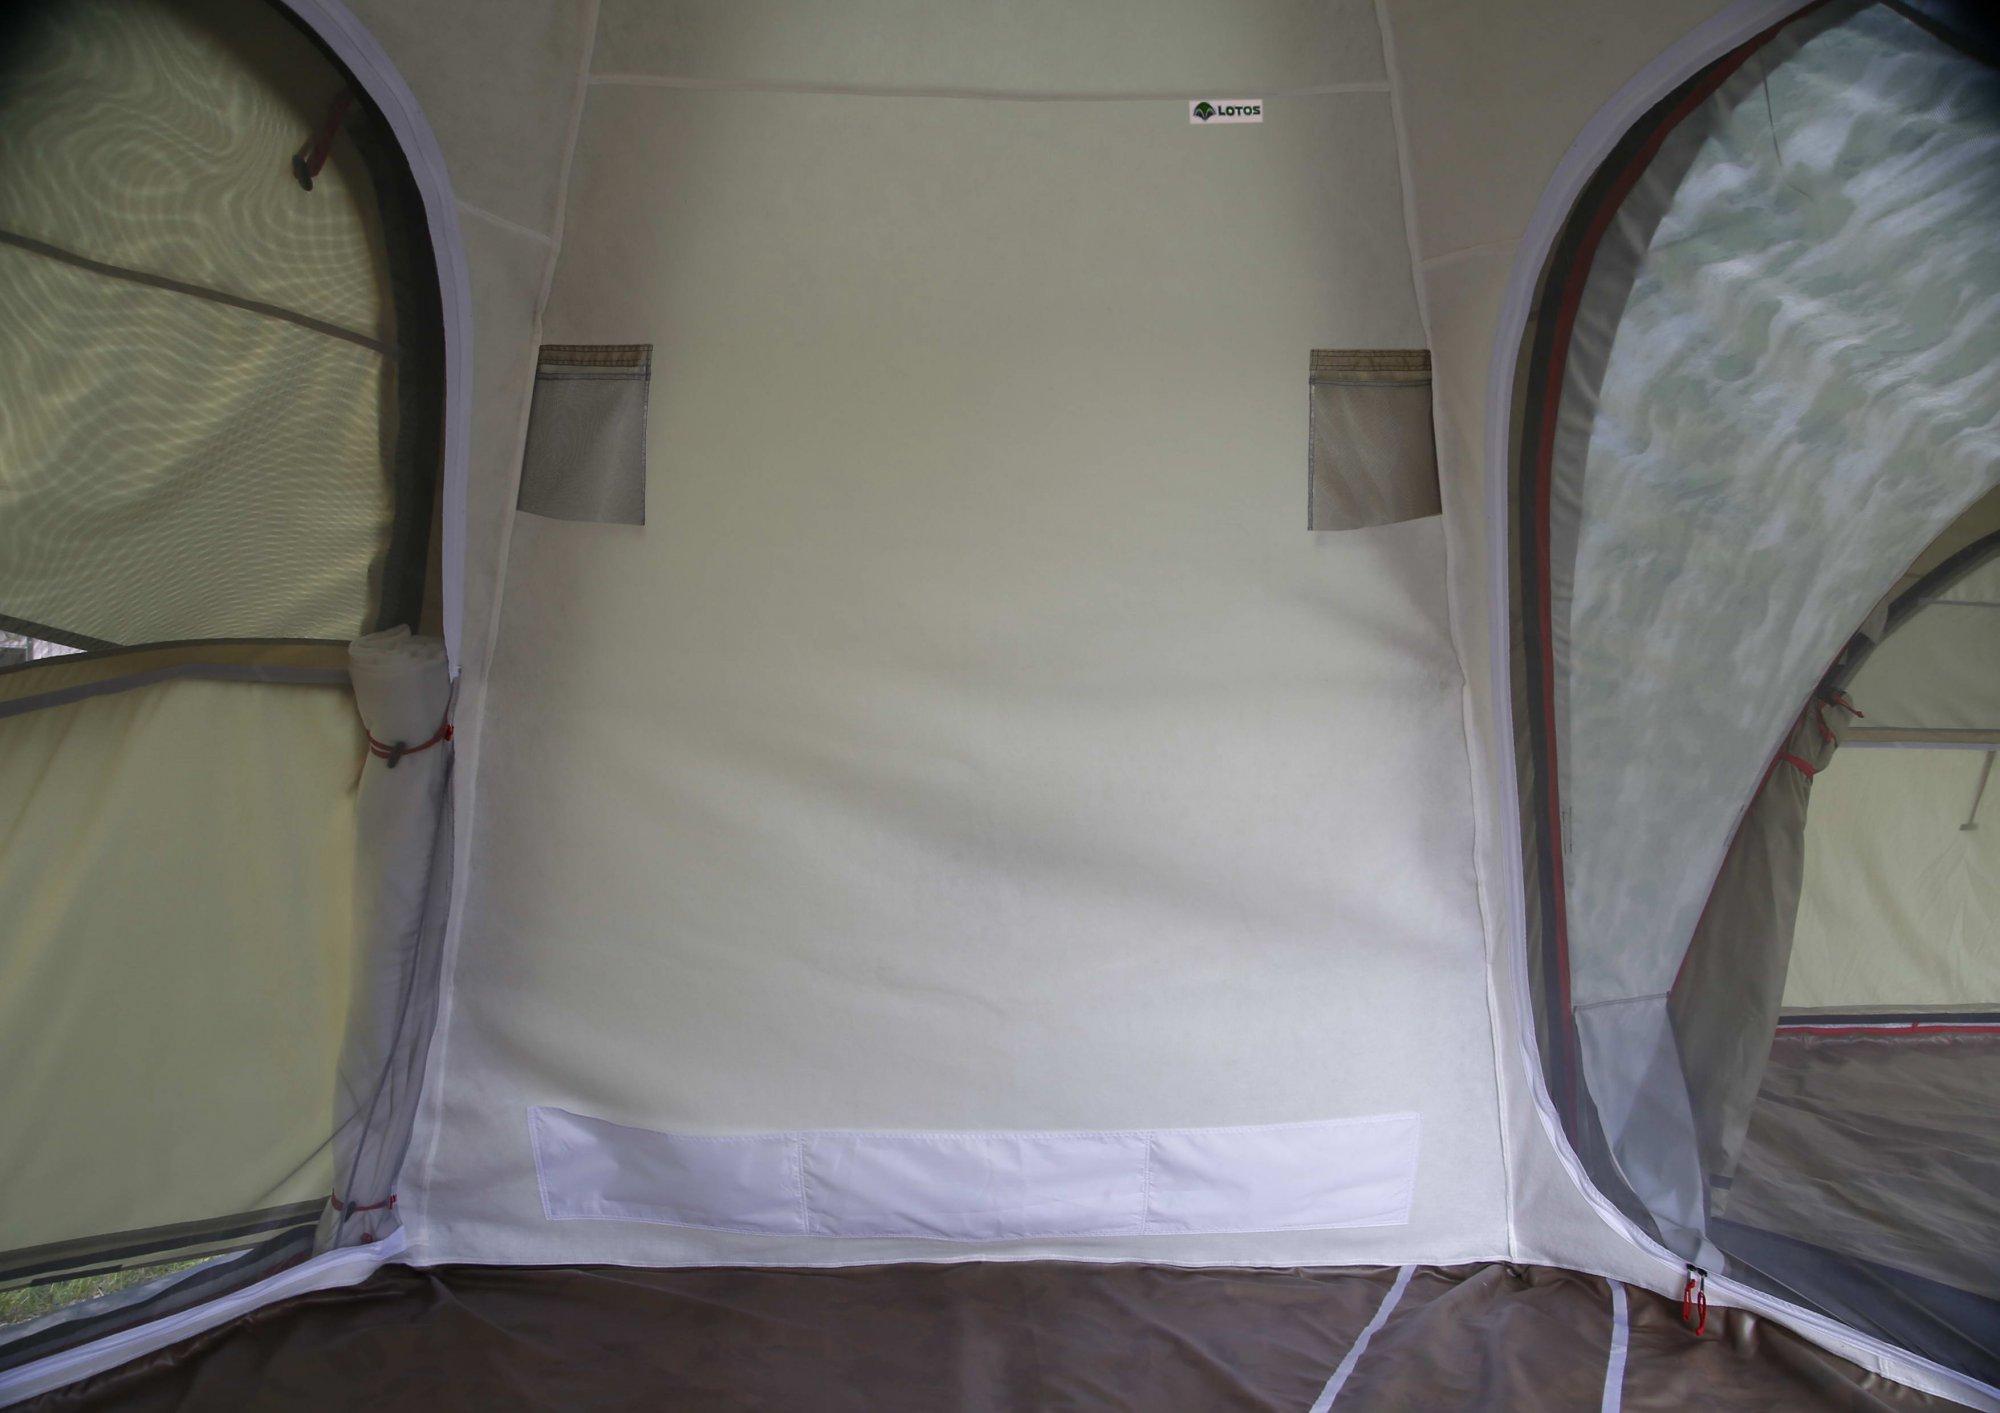 Внутренний тент-капсула утепленный ЛОТОС 5У (5-я стенка)